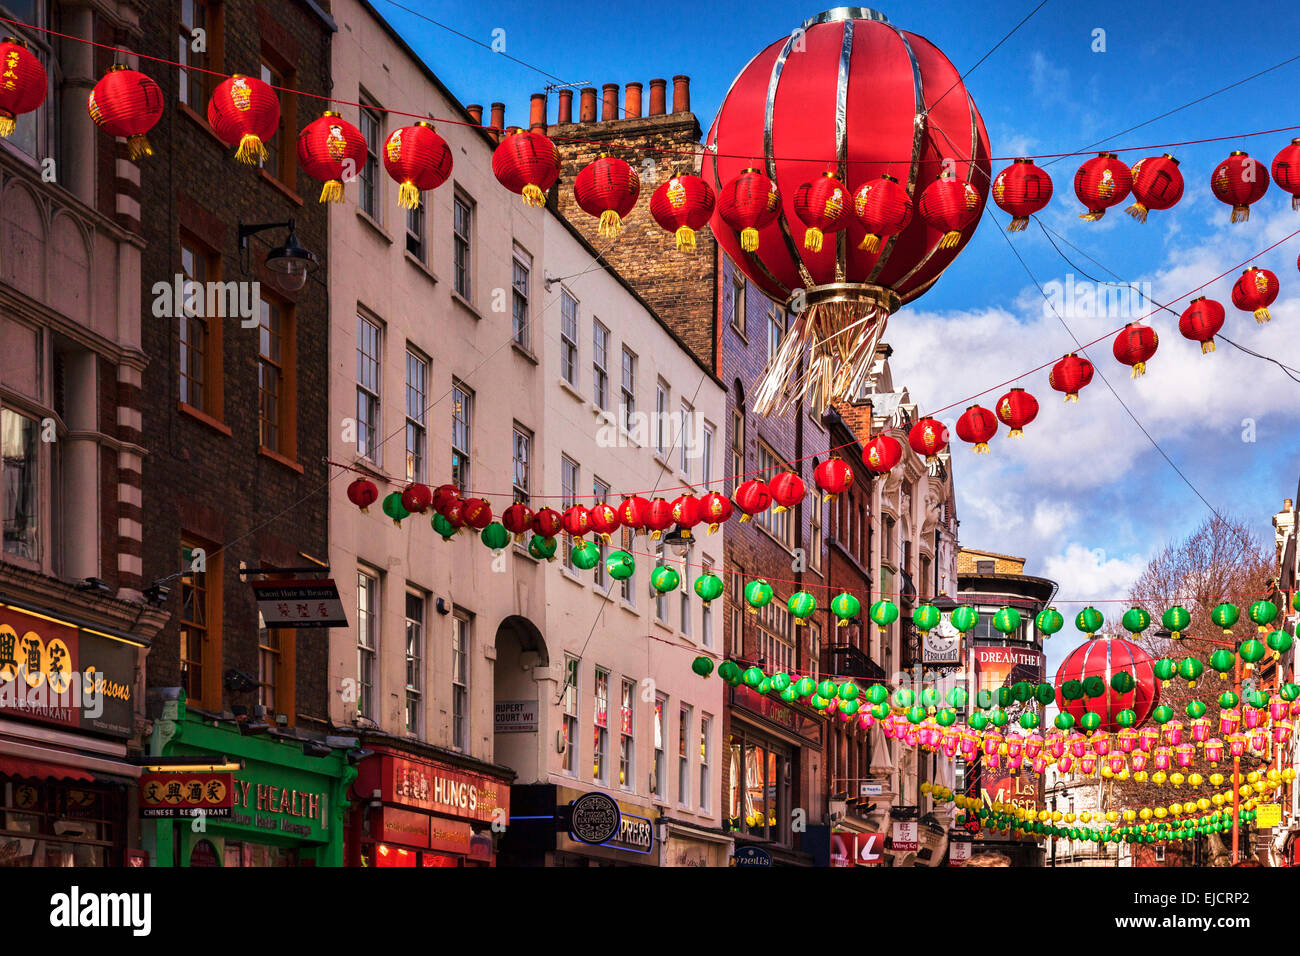 Chinatown, London, England. - Stock Image